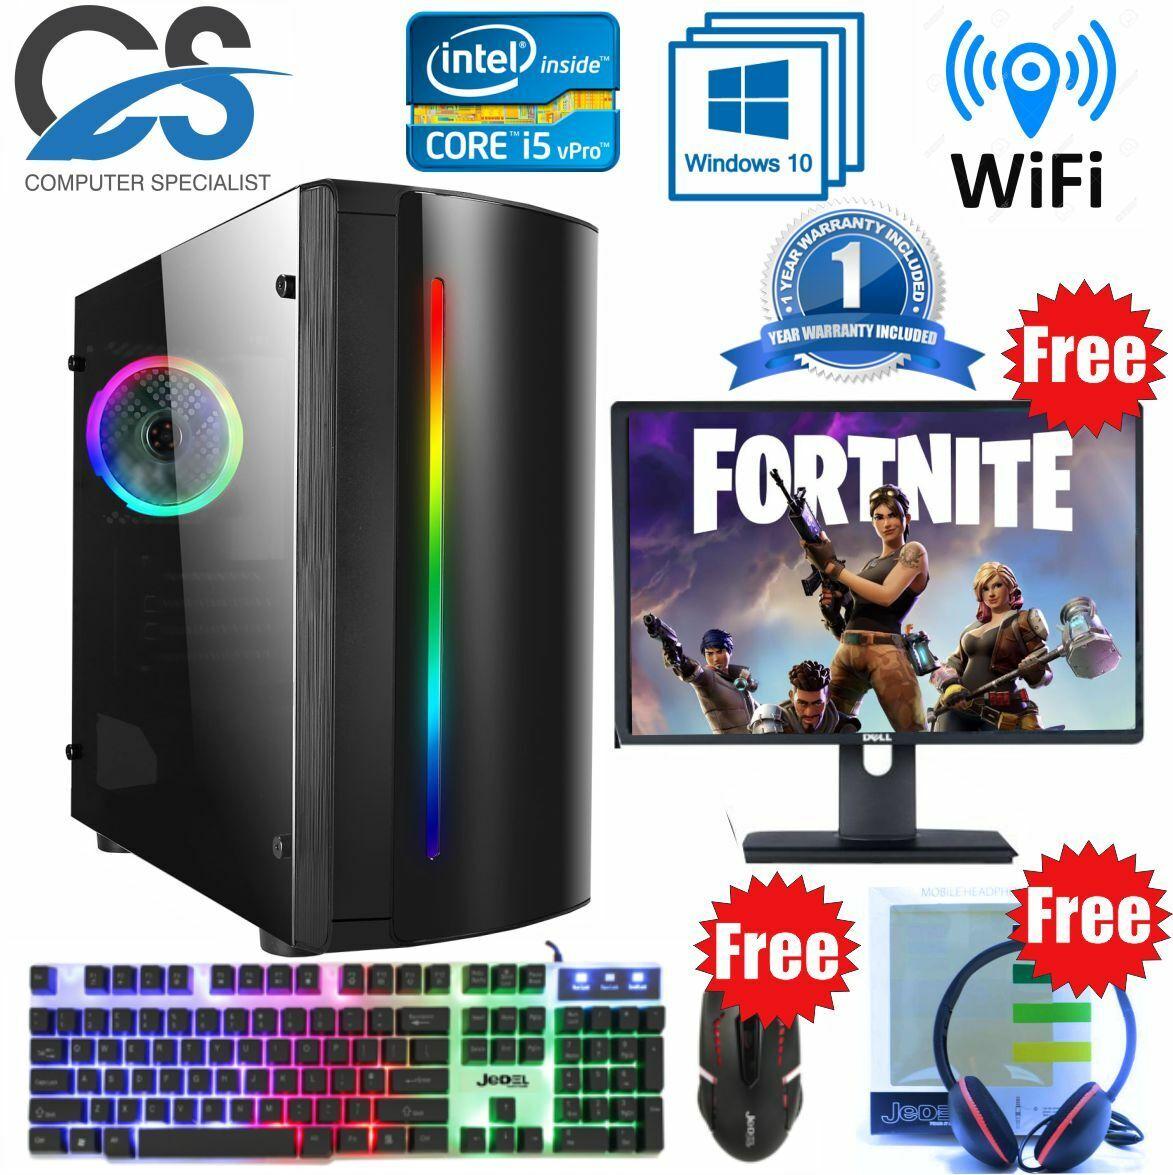 Computer Games - Fast Gaming PC Computer Bundle Intel Quad Core i5 8GB 1TB 2GB GT710 Win10 Beam